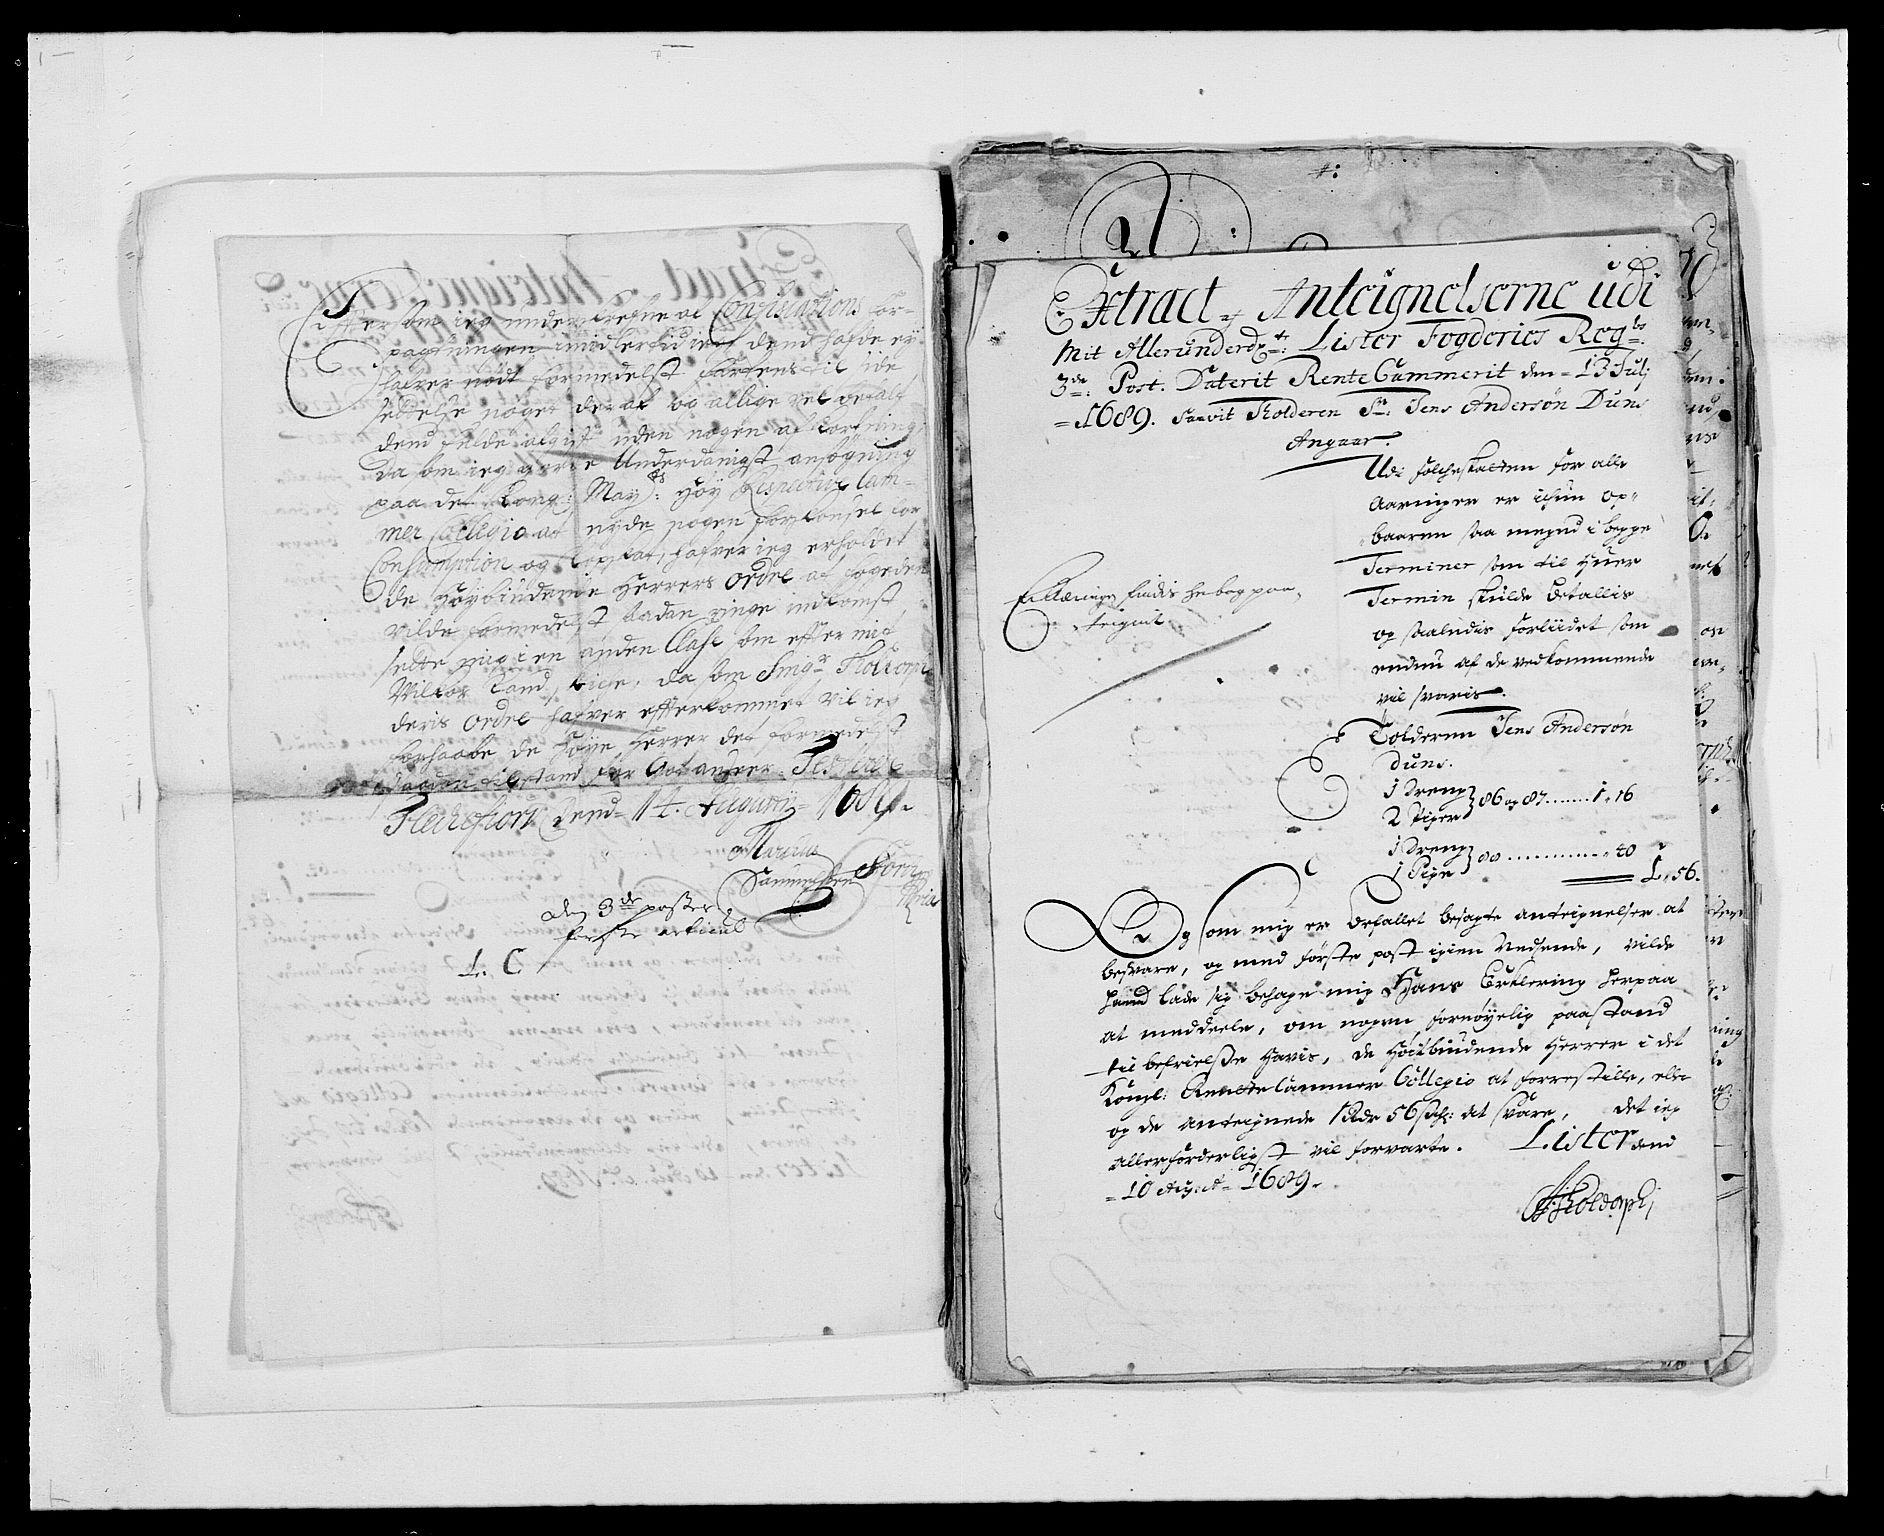 RA, Rentekammeret inntil 1814, Reviderte regnskaper, Fogderegnskap, R41/L2535: Fogderegnskap Lista, 1686-1689, s. 205